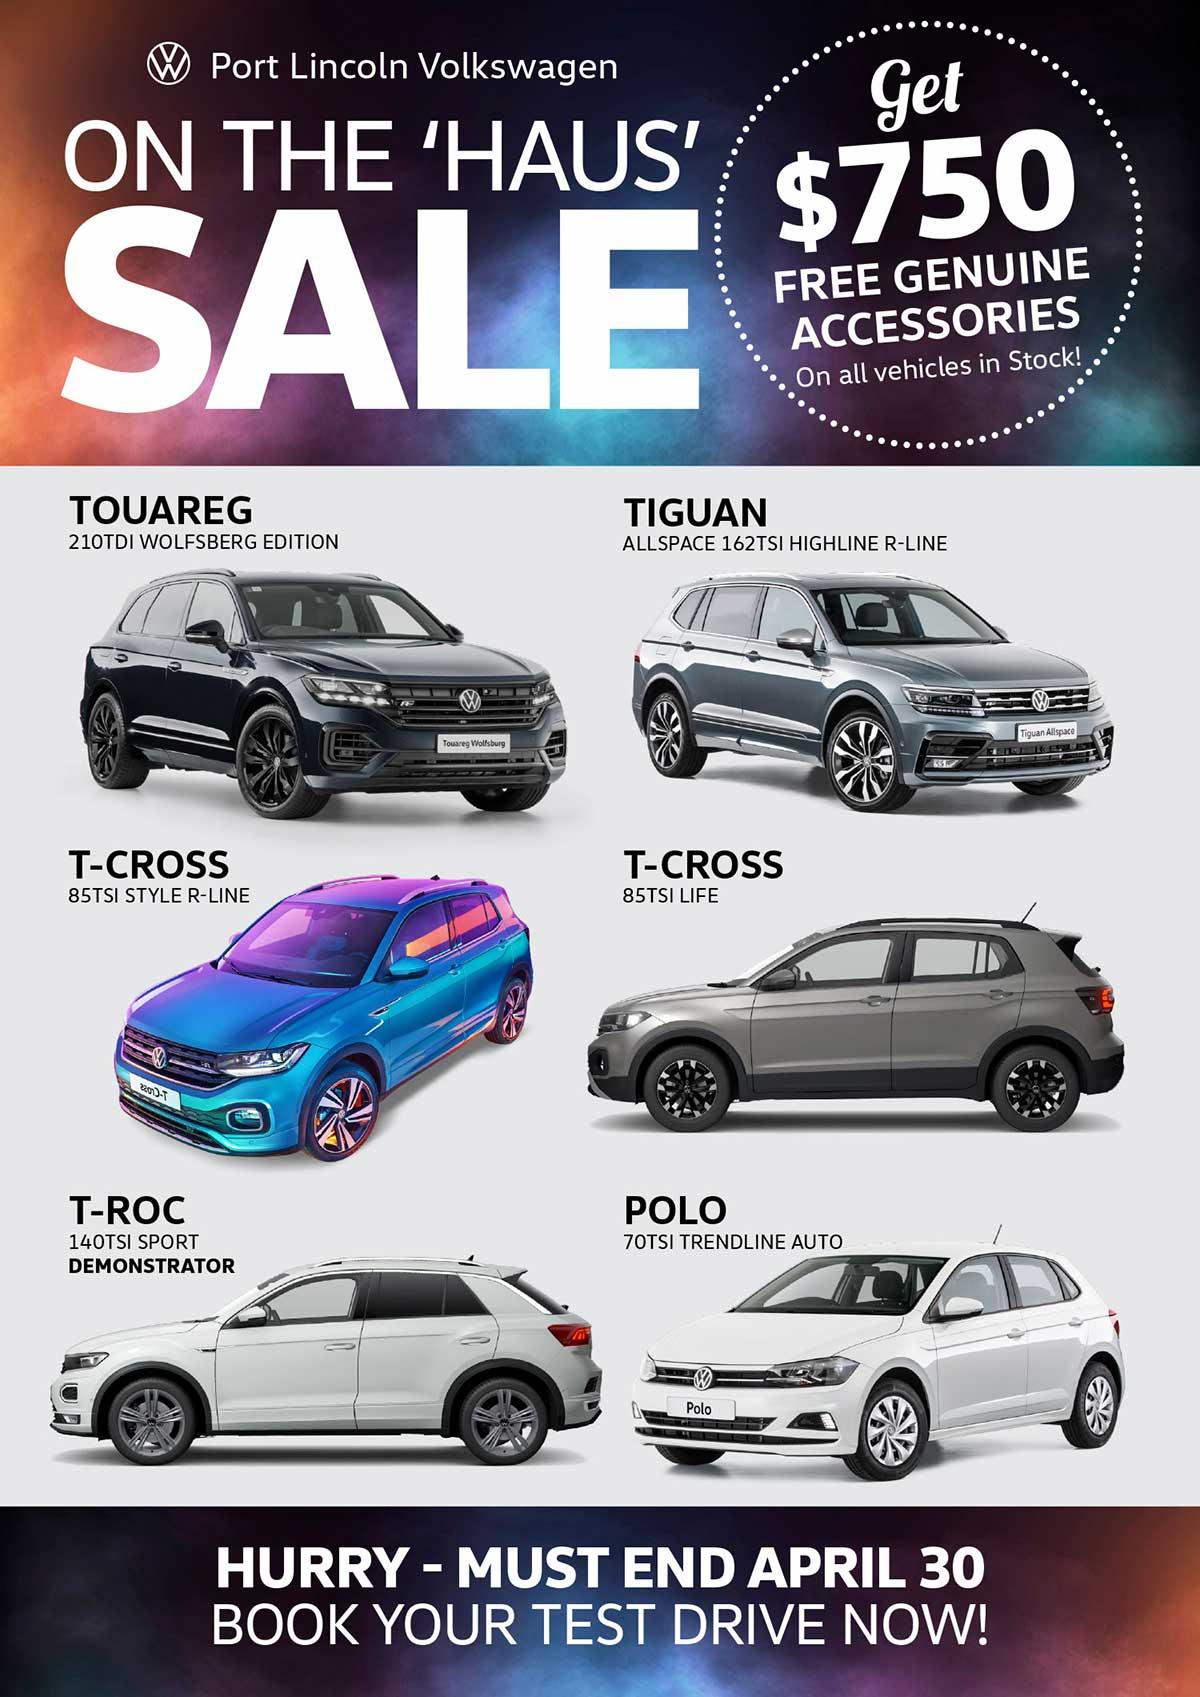 On Hous Sale - Port Lincoln Volkswagen| Eyre Car Centre